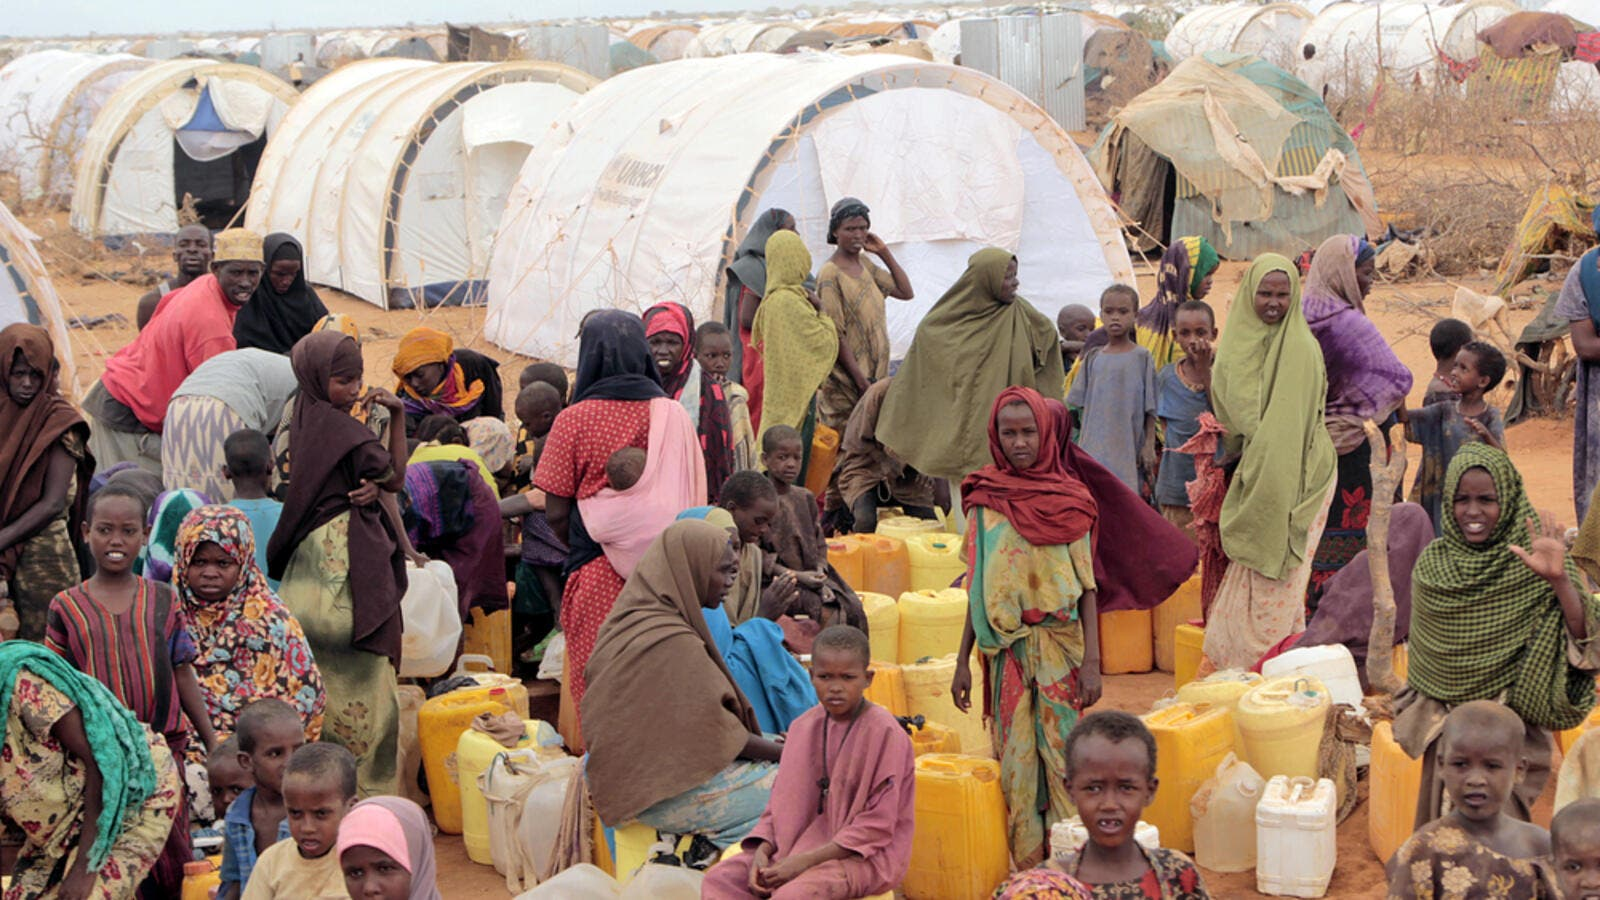 UN: 2.6 Million People Are Internally Displaced in Somalia | Al Bawaba